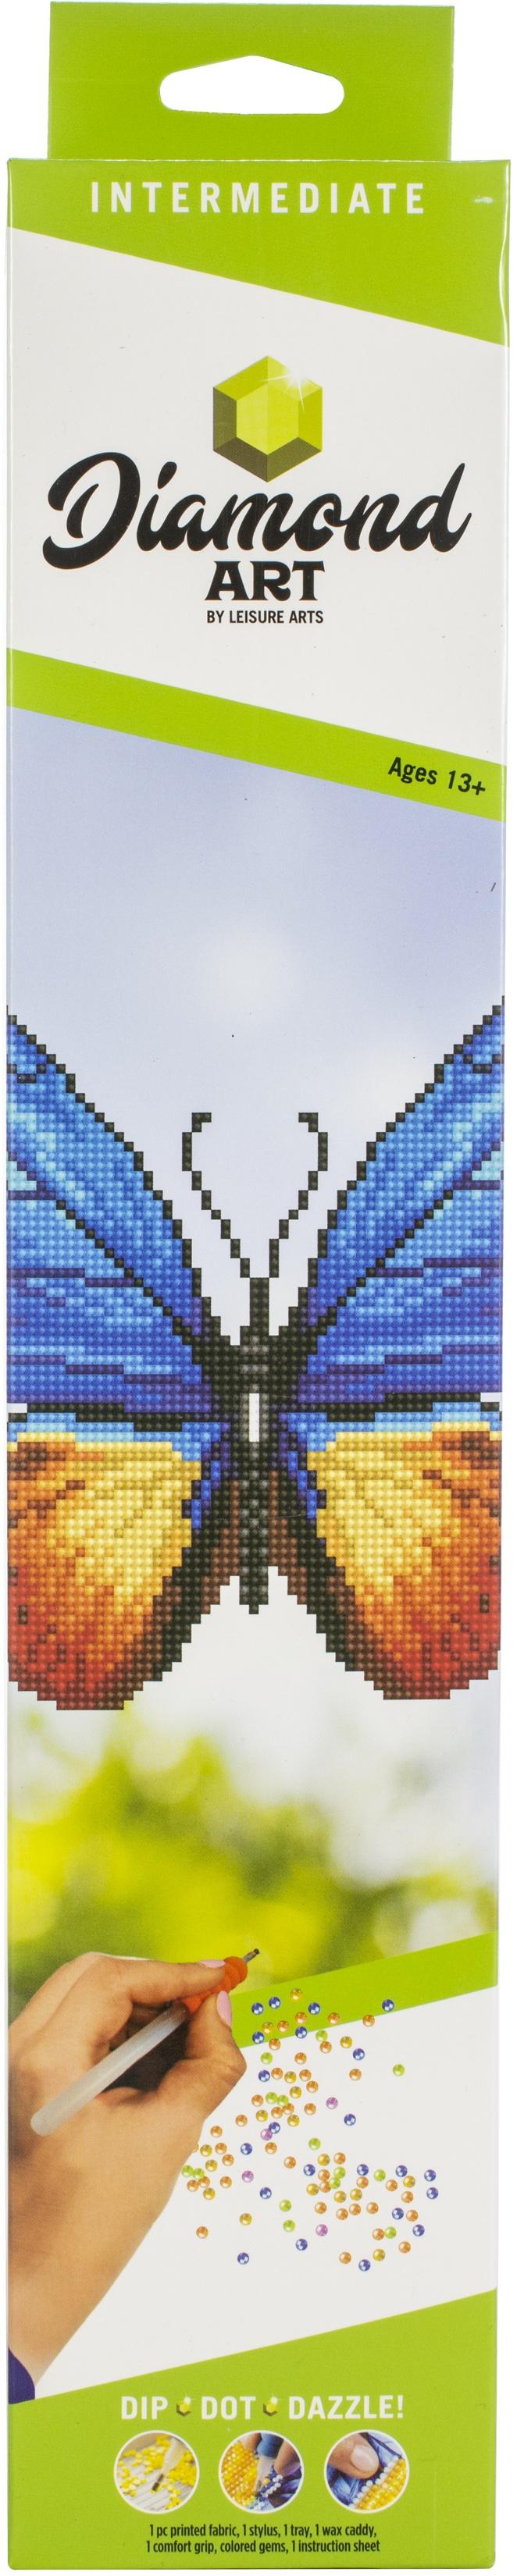 Diamond Art Kit 12x12 Intermediate Butterfly